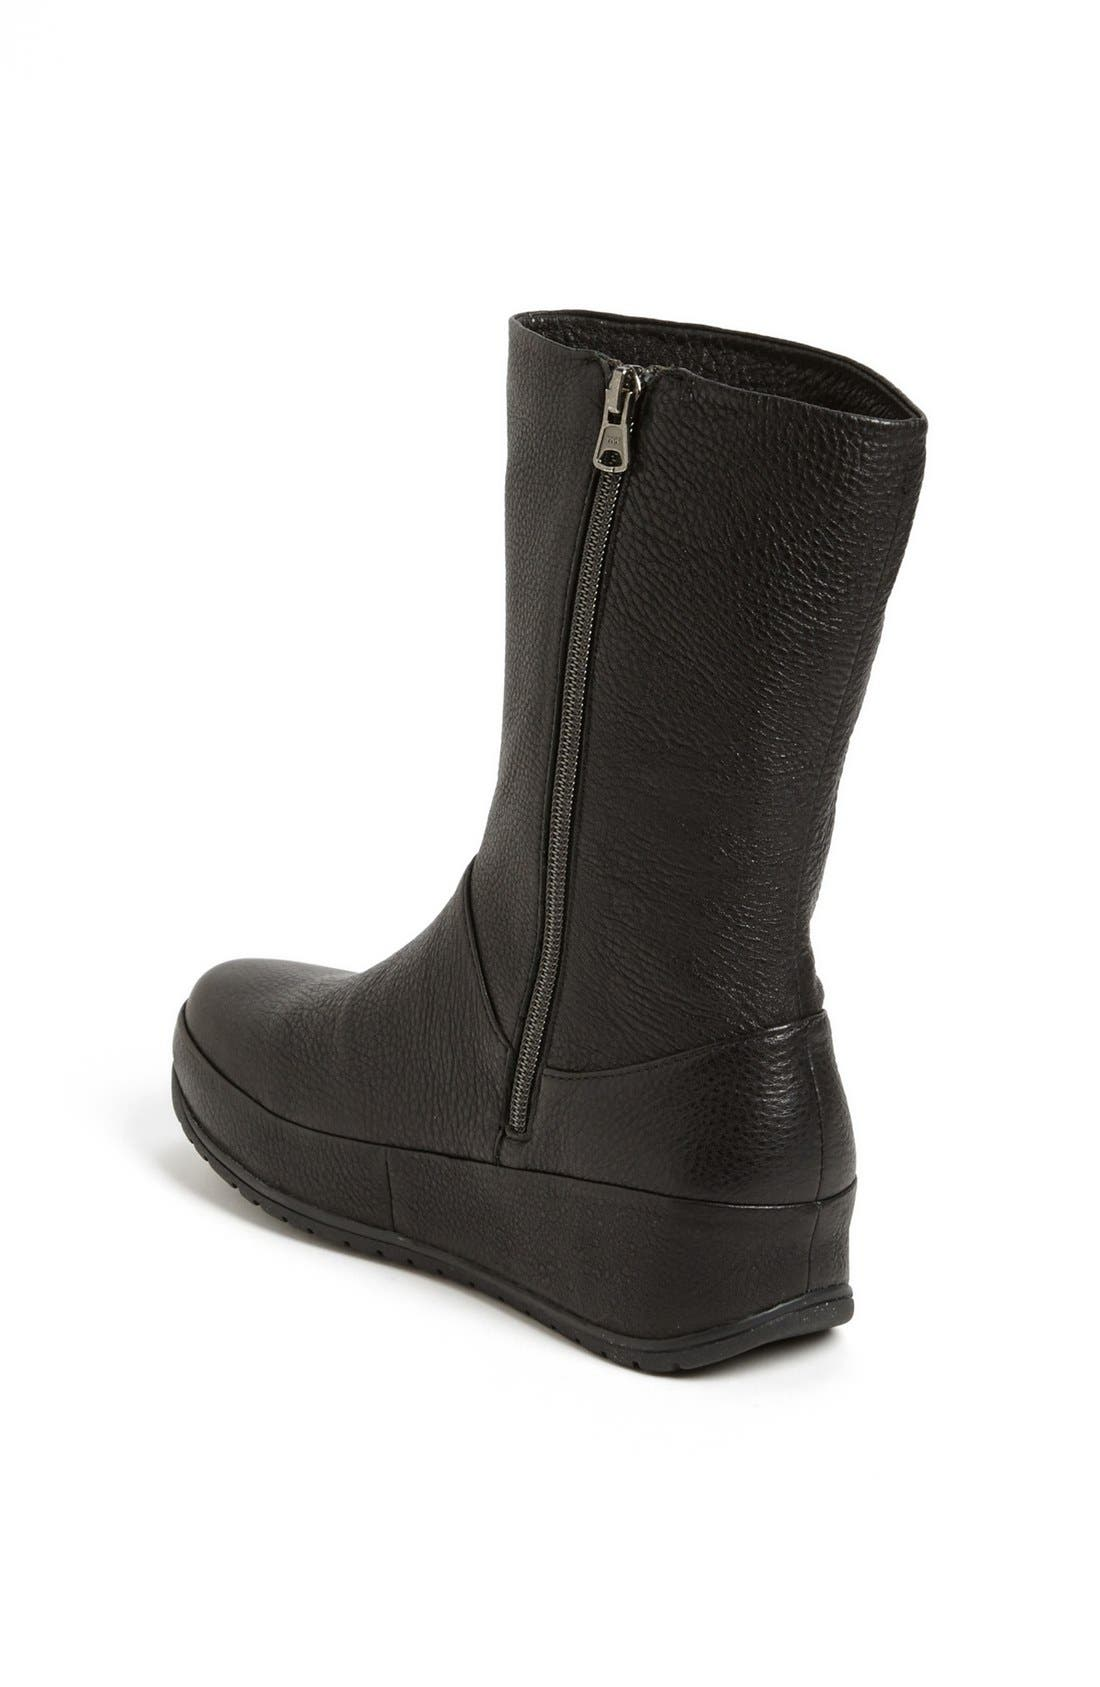 Alternate Image 2  - FitFlop 'Joplin' Leather Boot